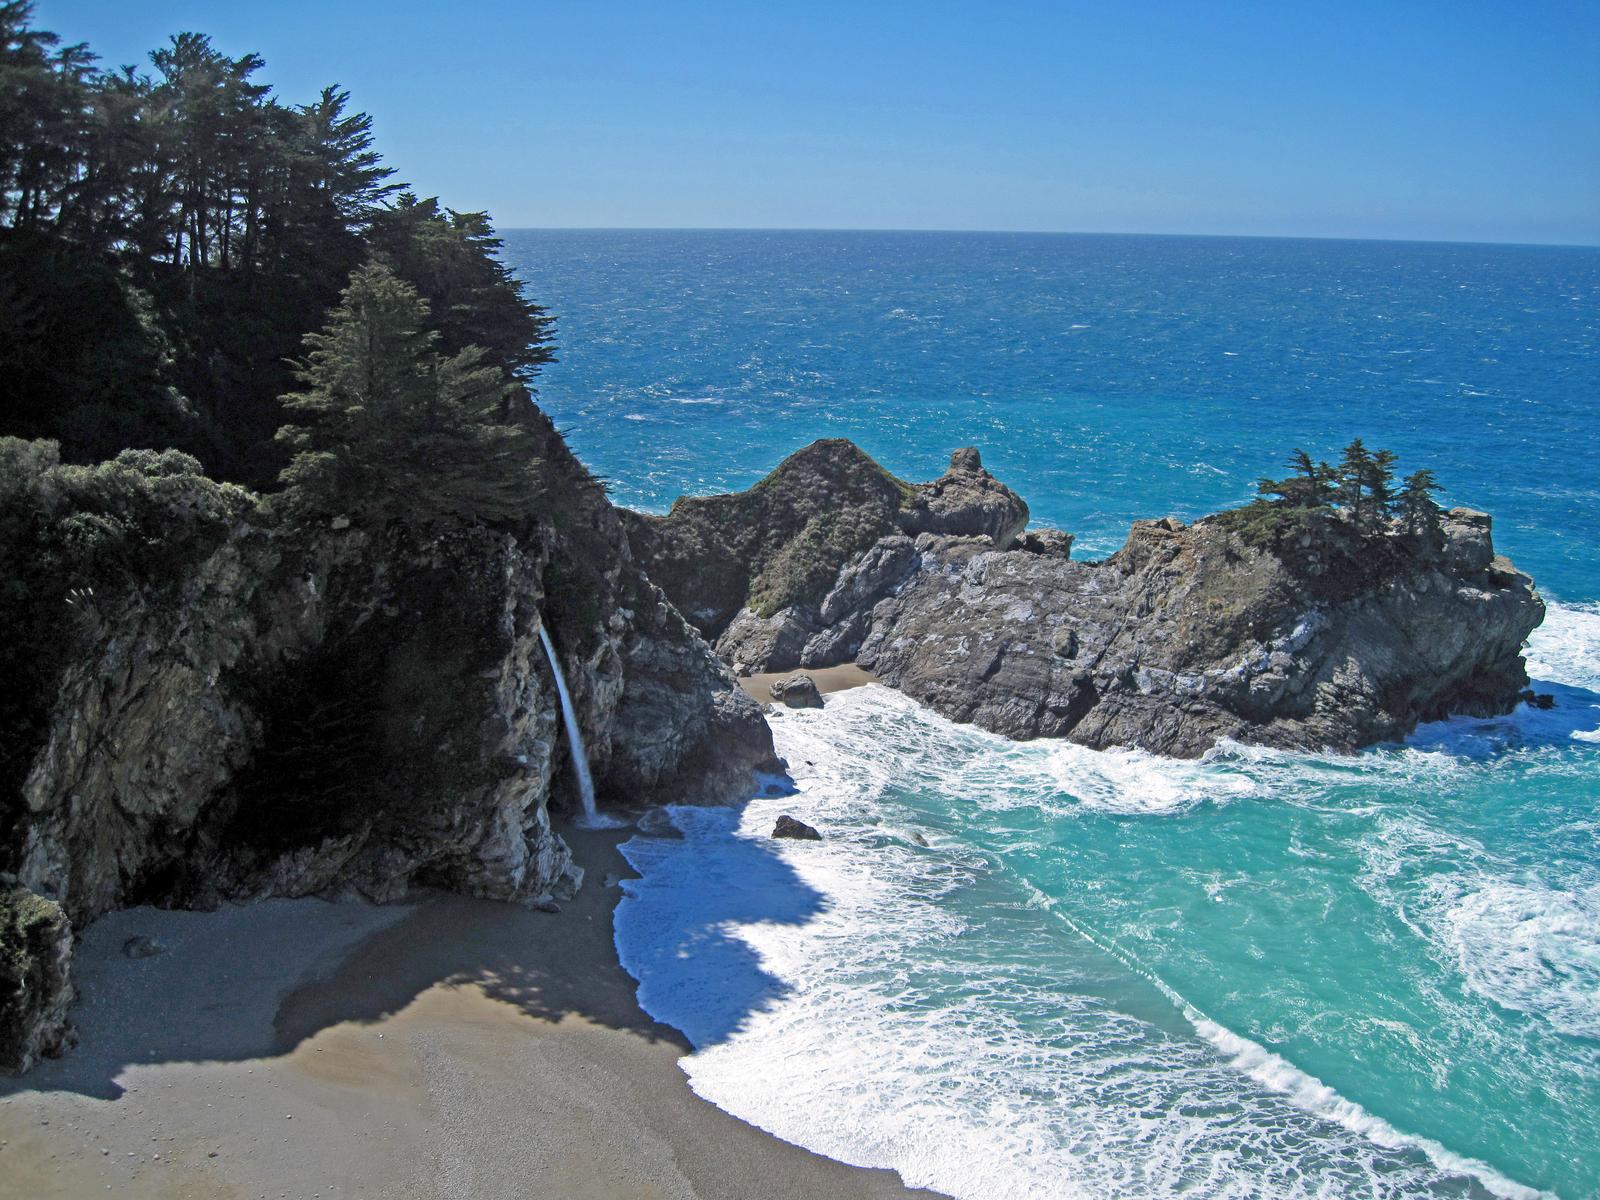 Julia Pfeiffer Burns State Park, Big Sur coast, California